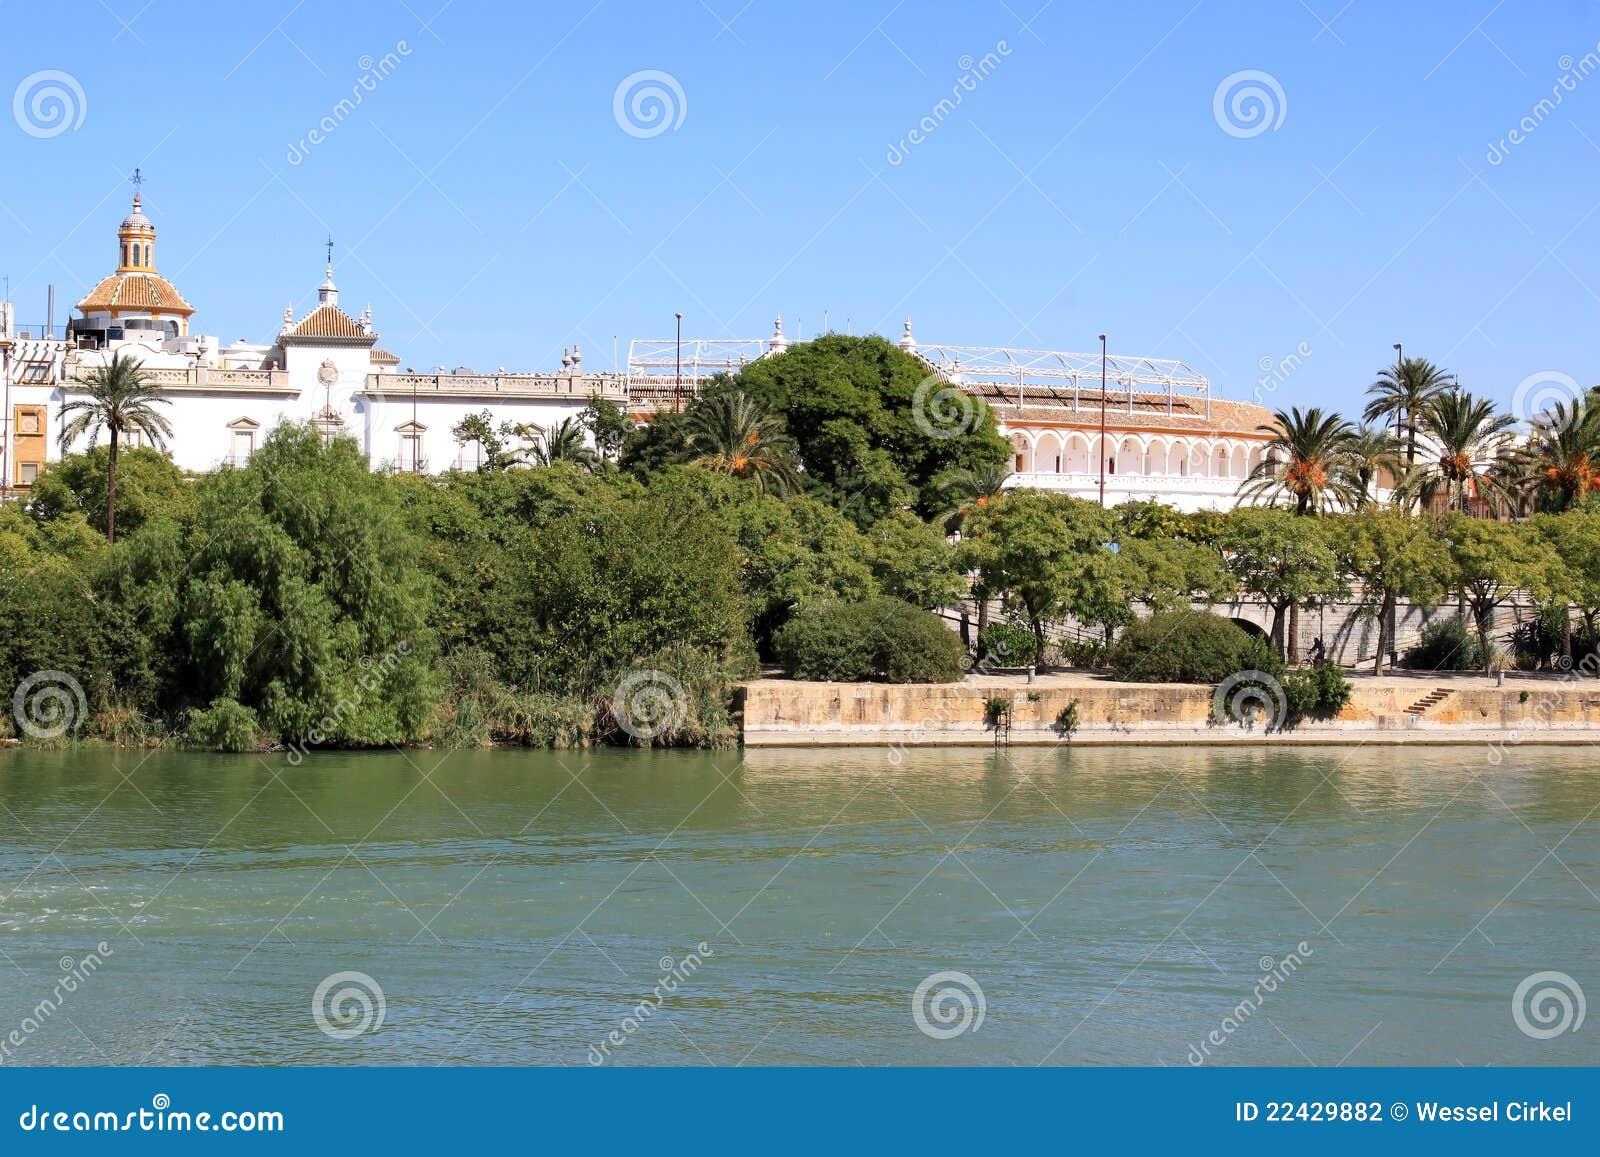 Plaza de Toros and the Guadalquivir River, Seville